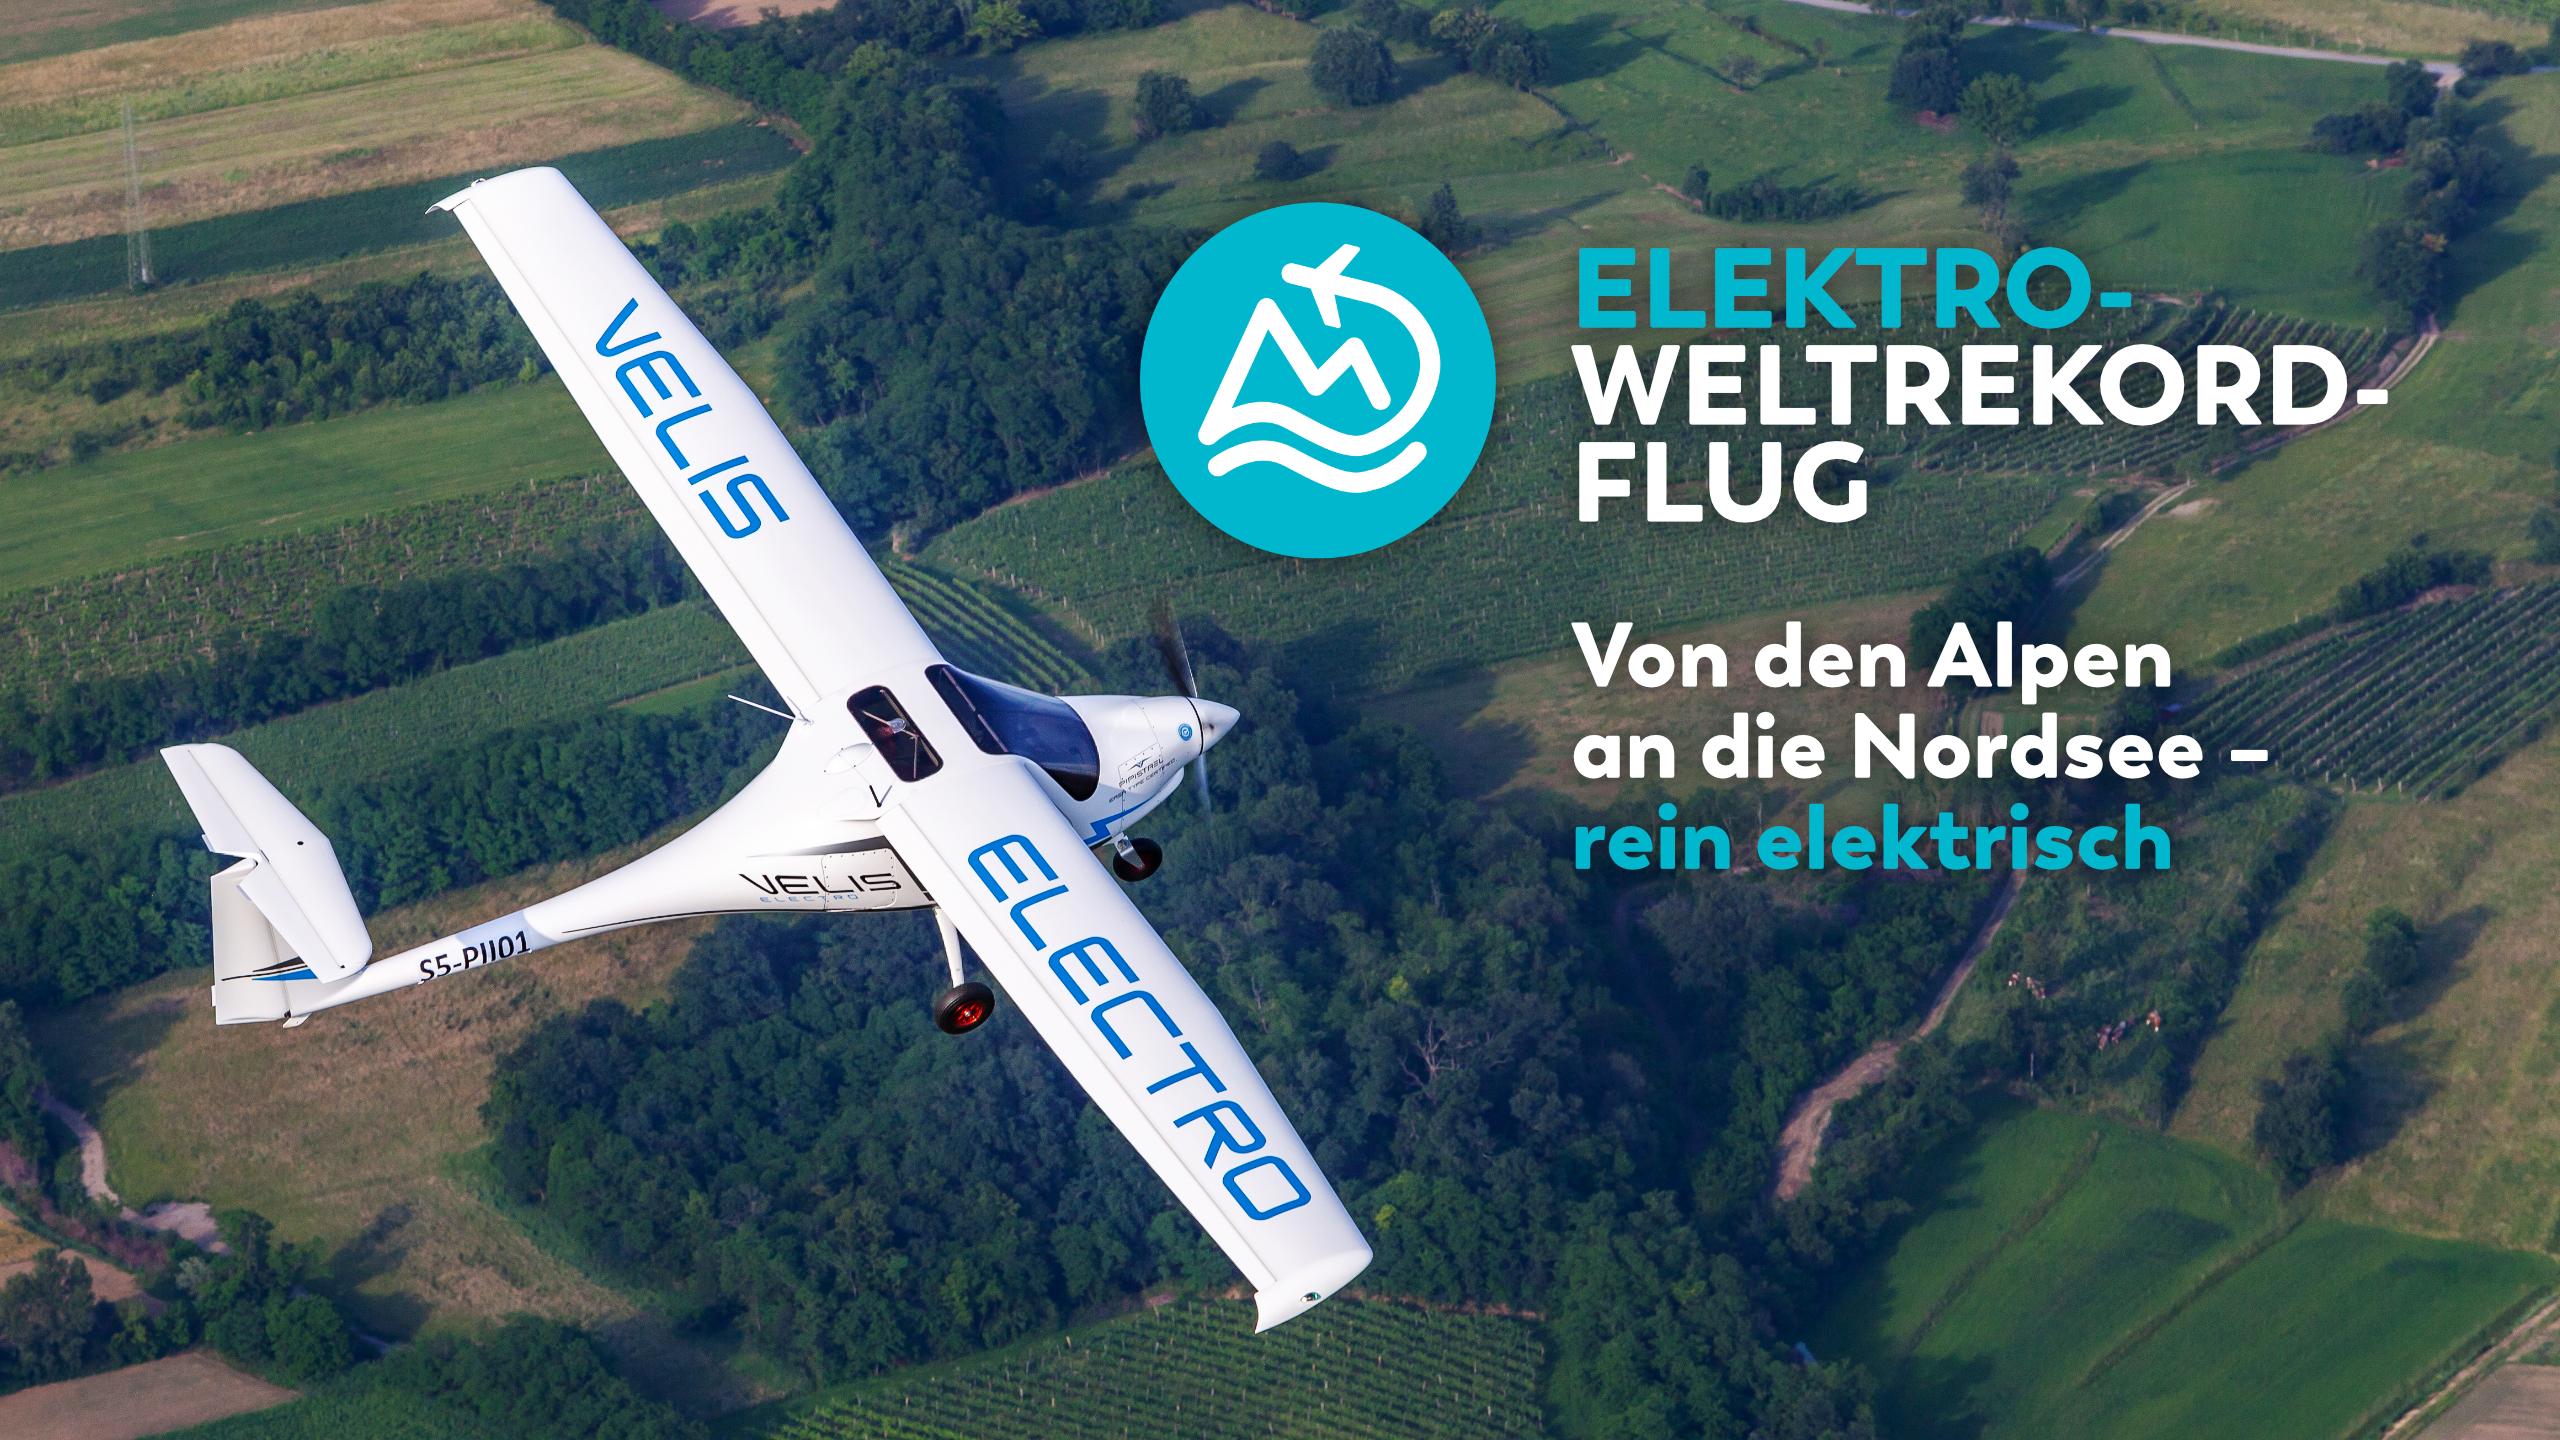 Weltrekord-Elektro-Flug